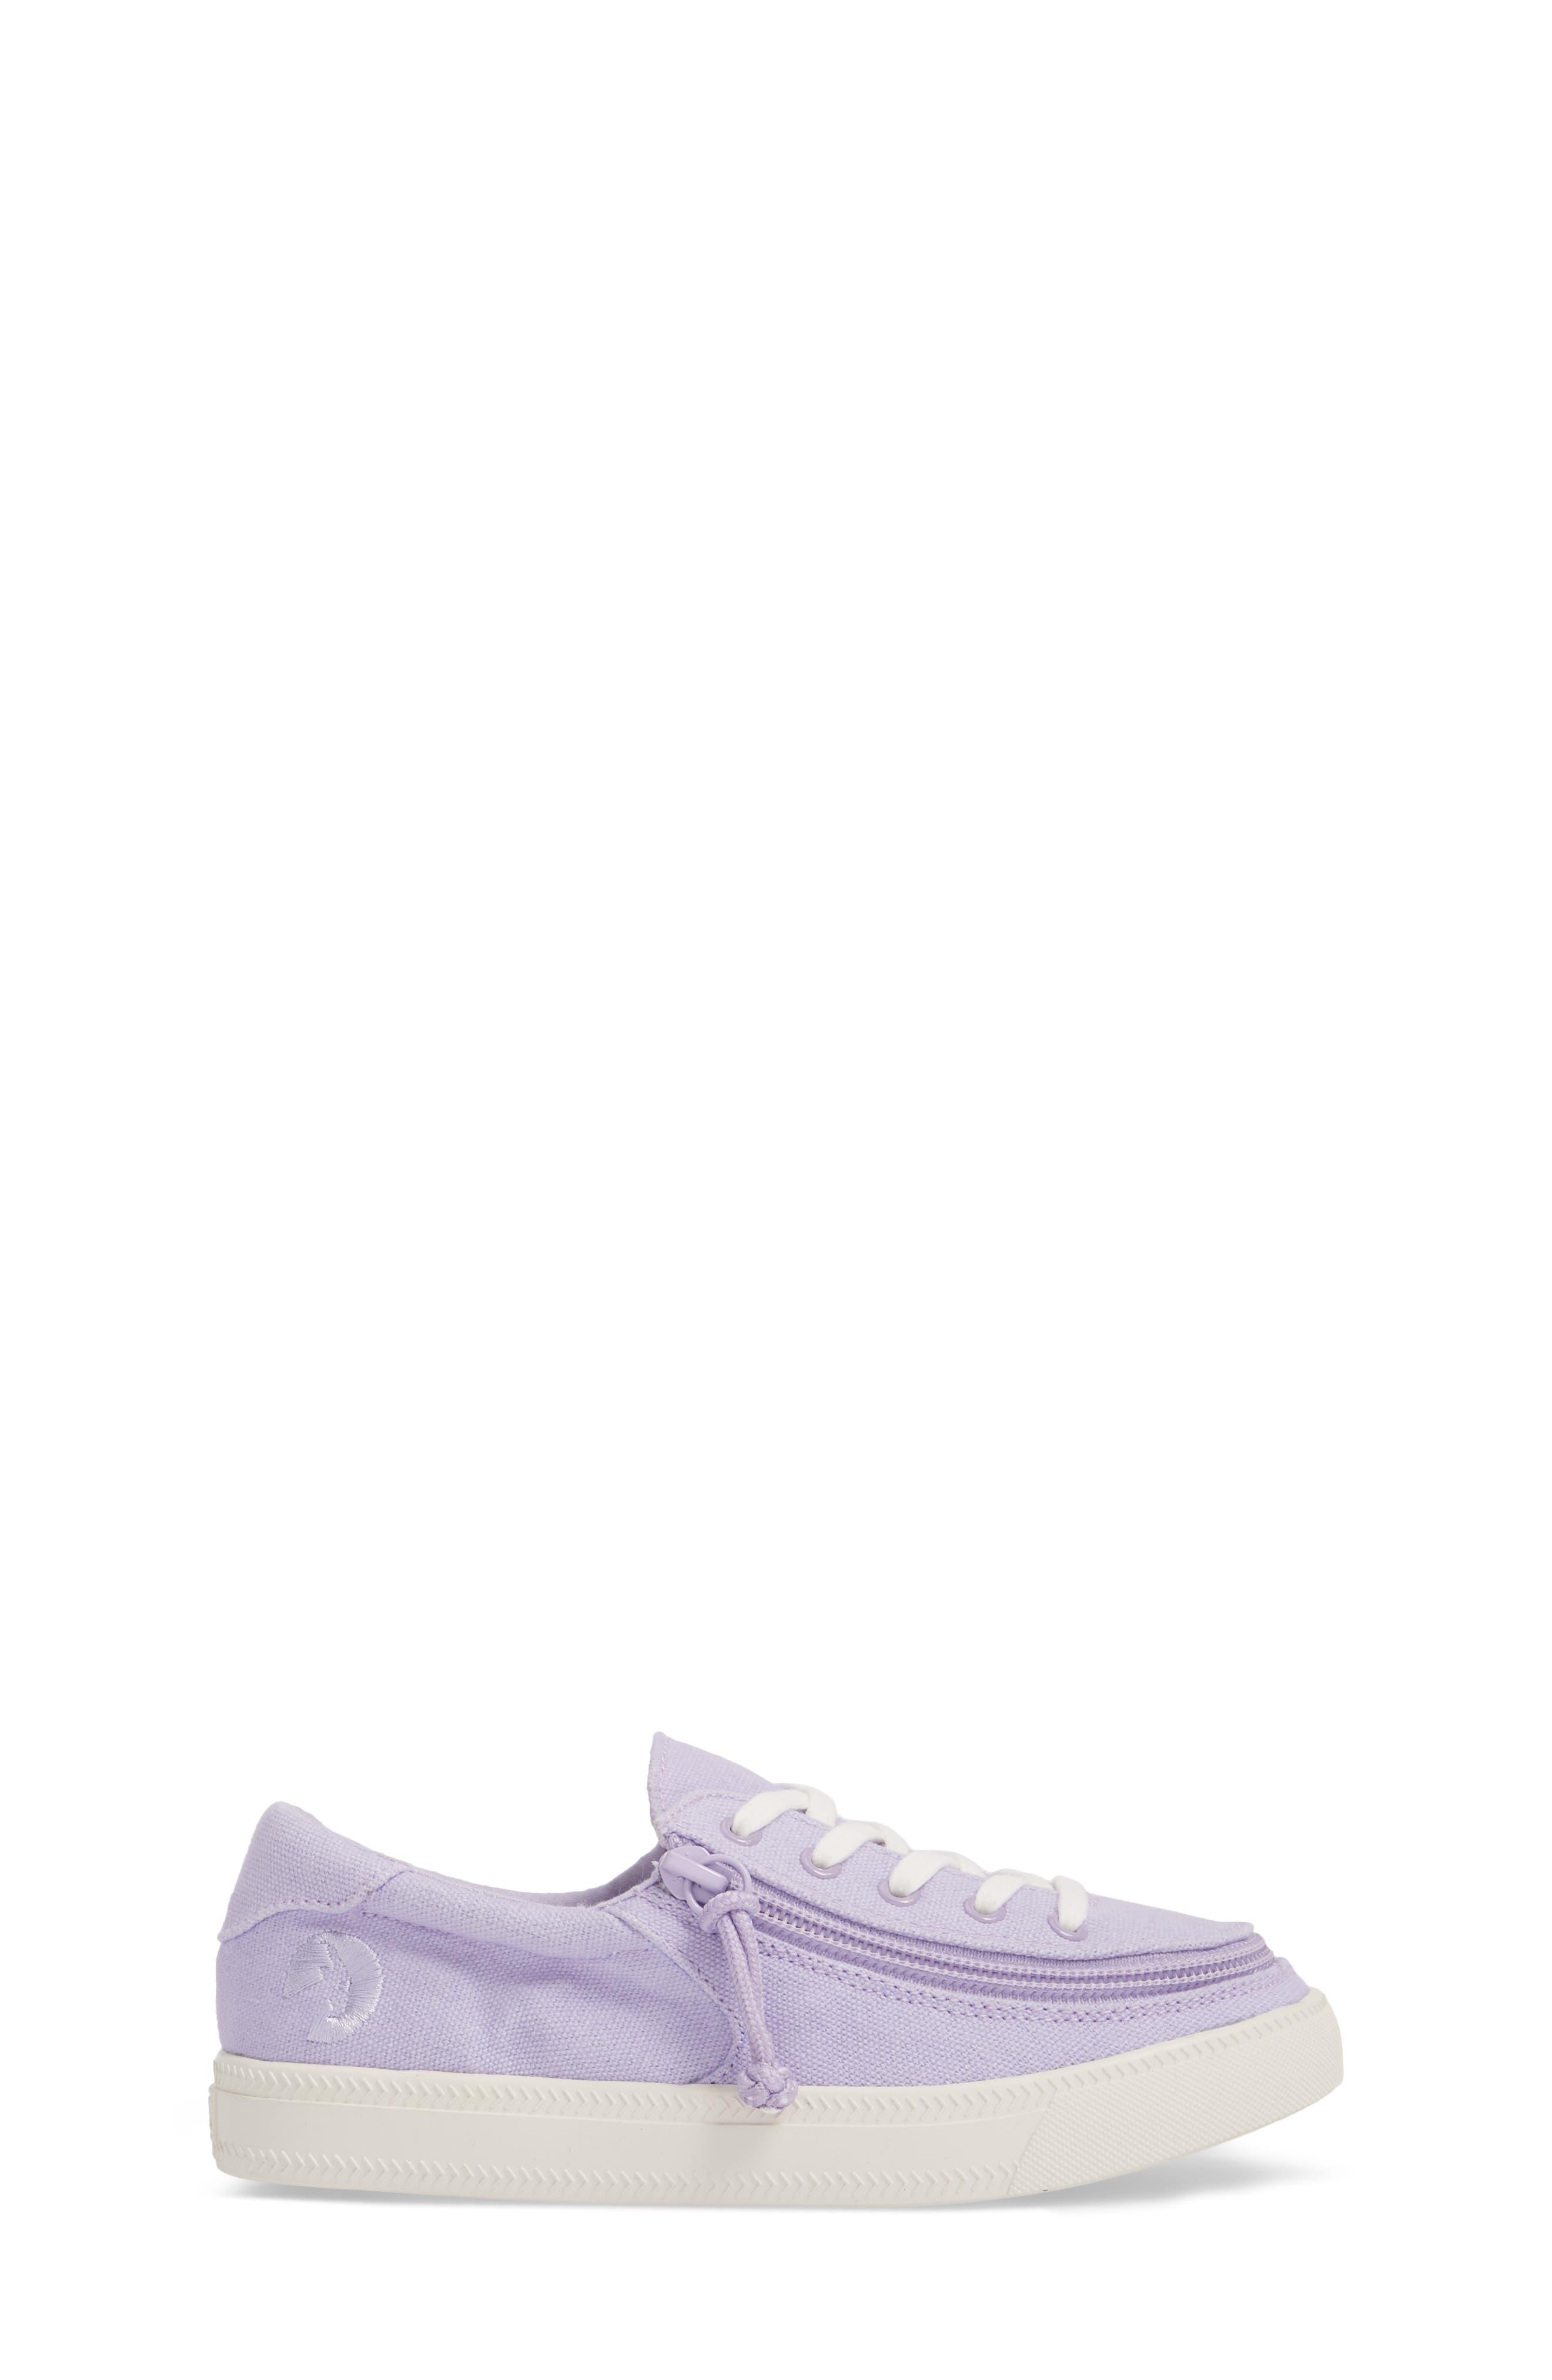 BILLY FOOTWEAR, Classic Zip Around Low Top Sneaker, Alternate thumbnail 4, color, LAVENDER